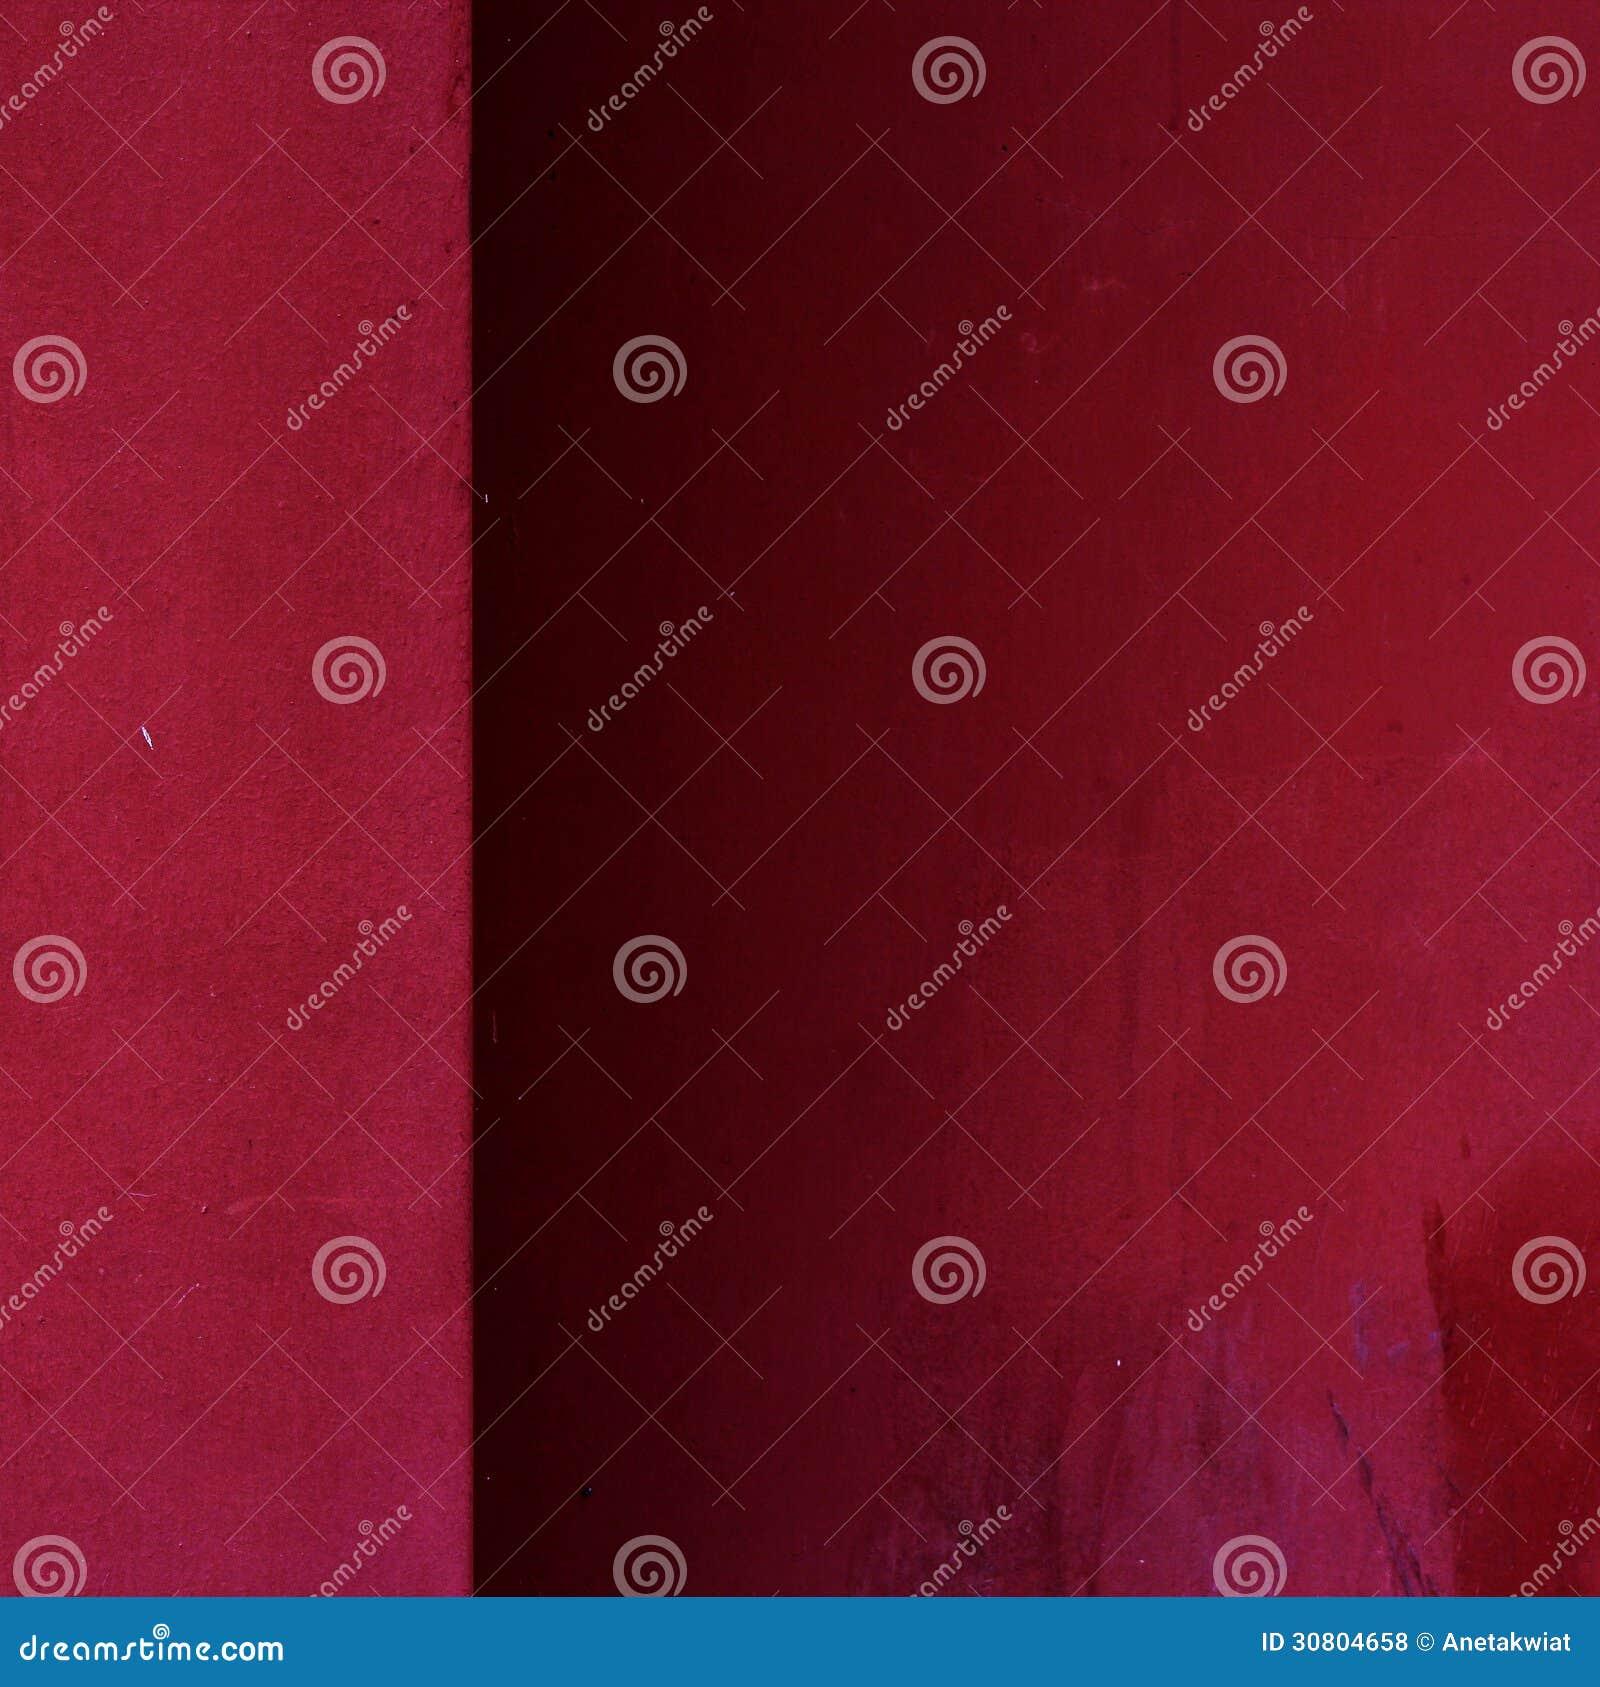 Bordeaux Wand Beschaffenheits Hintergrund Muster Stockfoto Bild